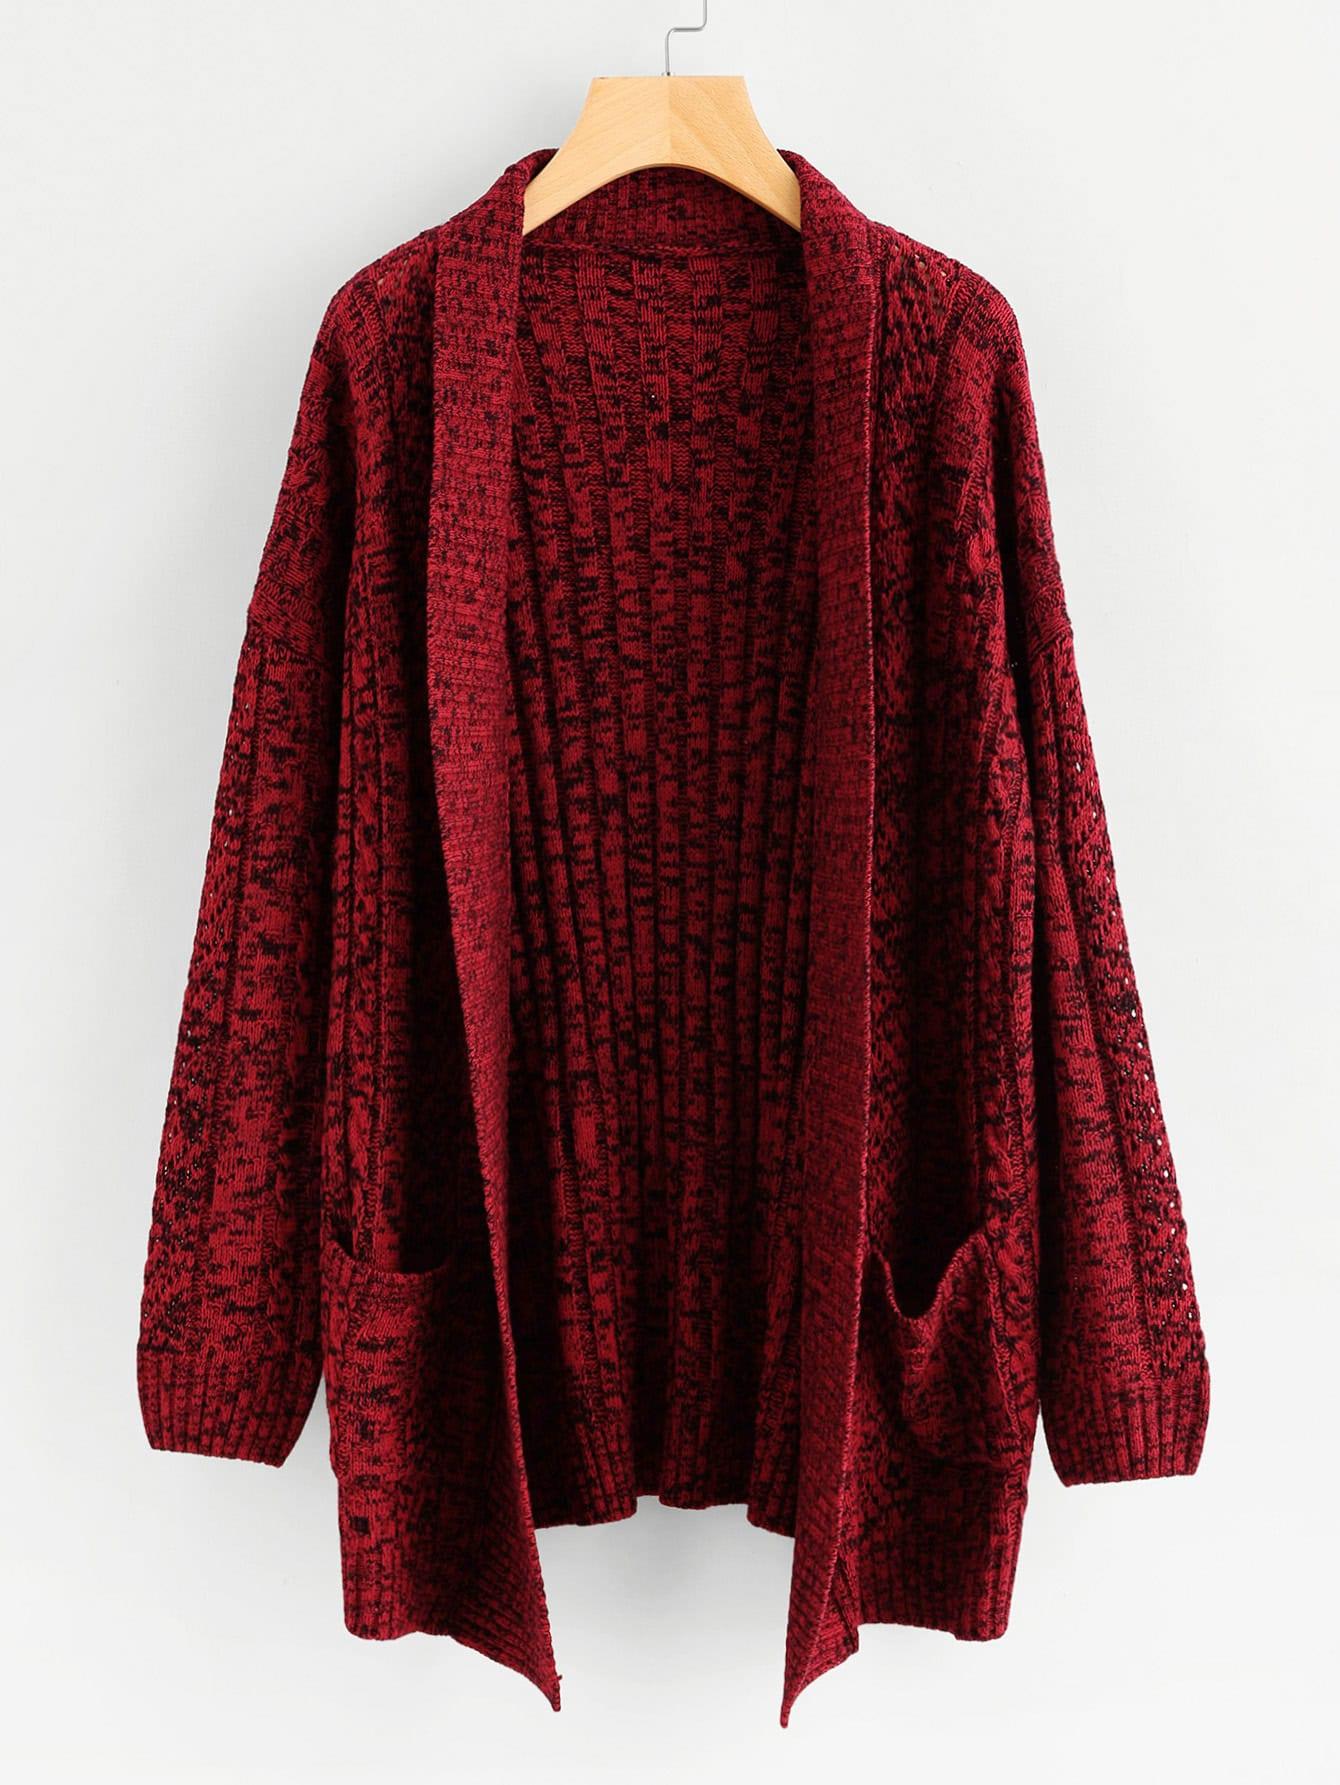 Two Tone Rib Knit Cardigan